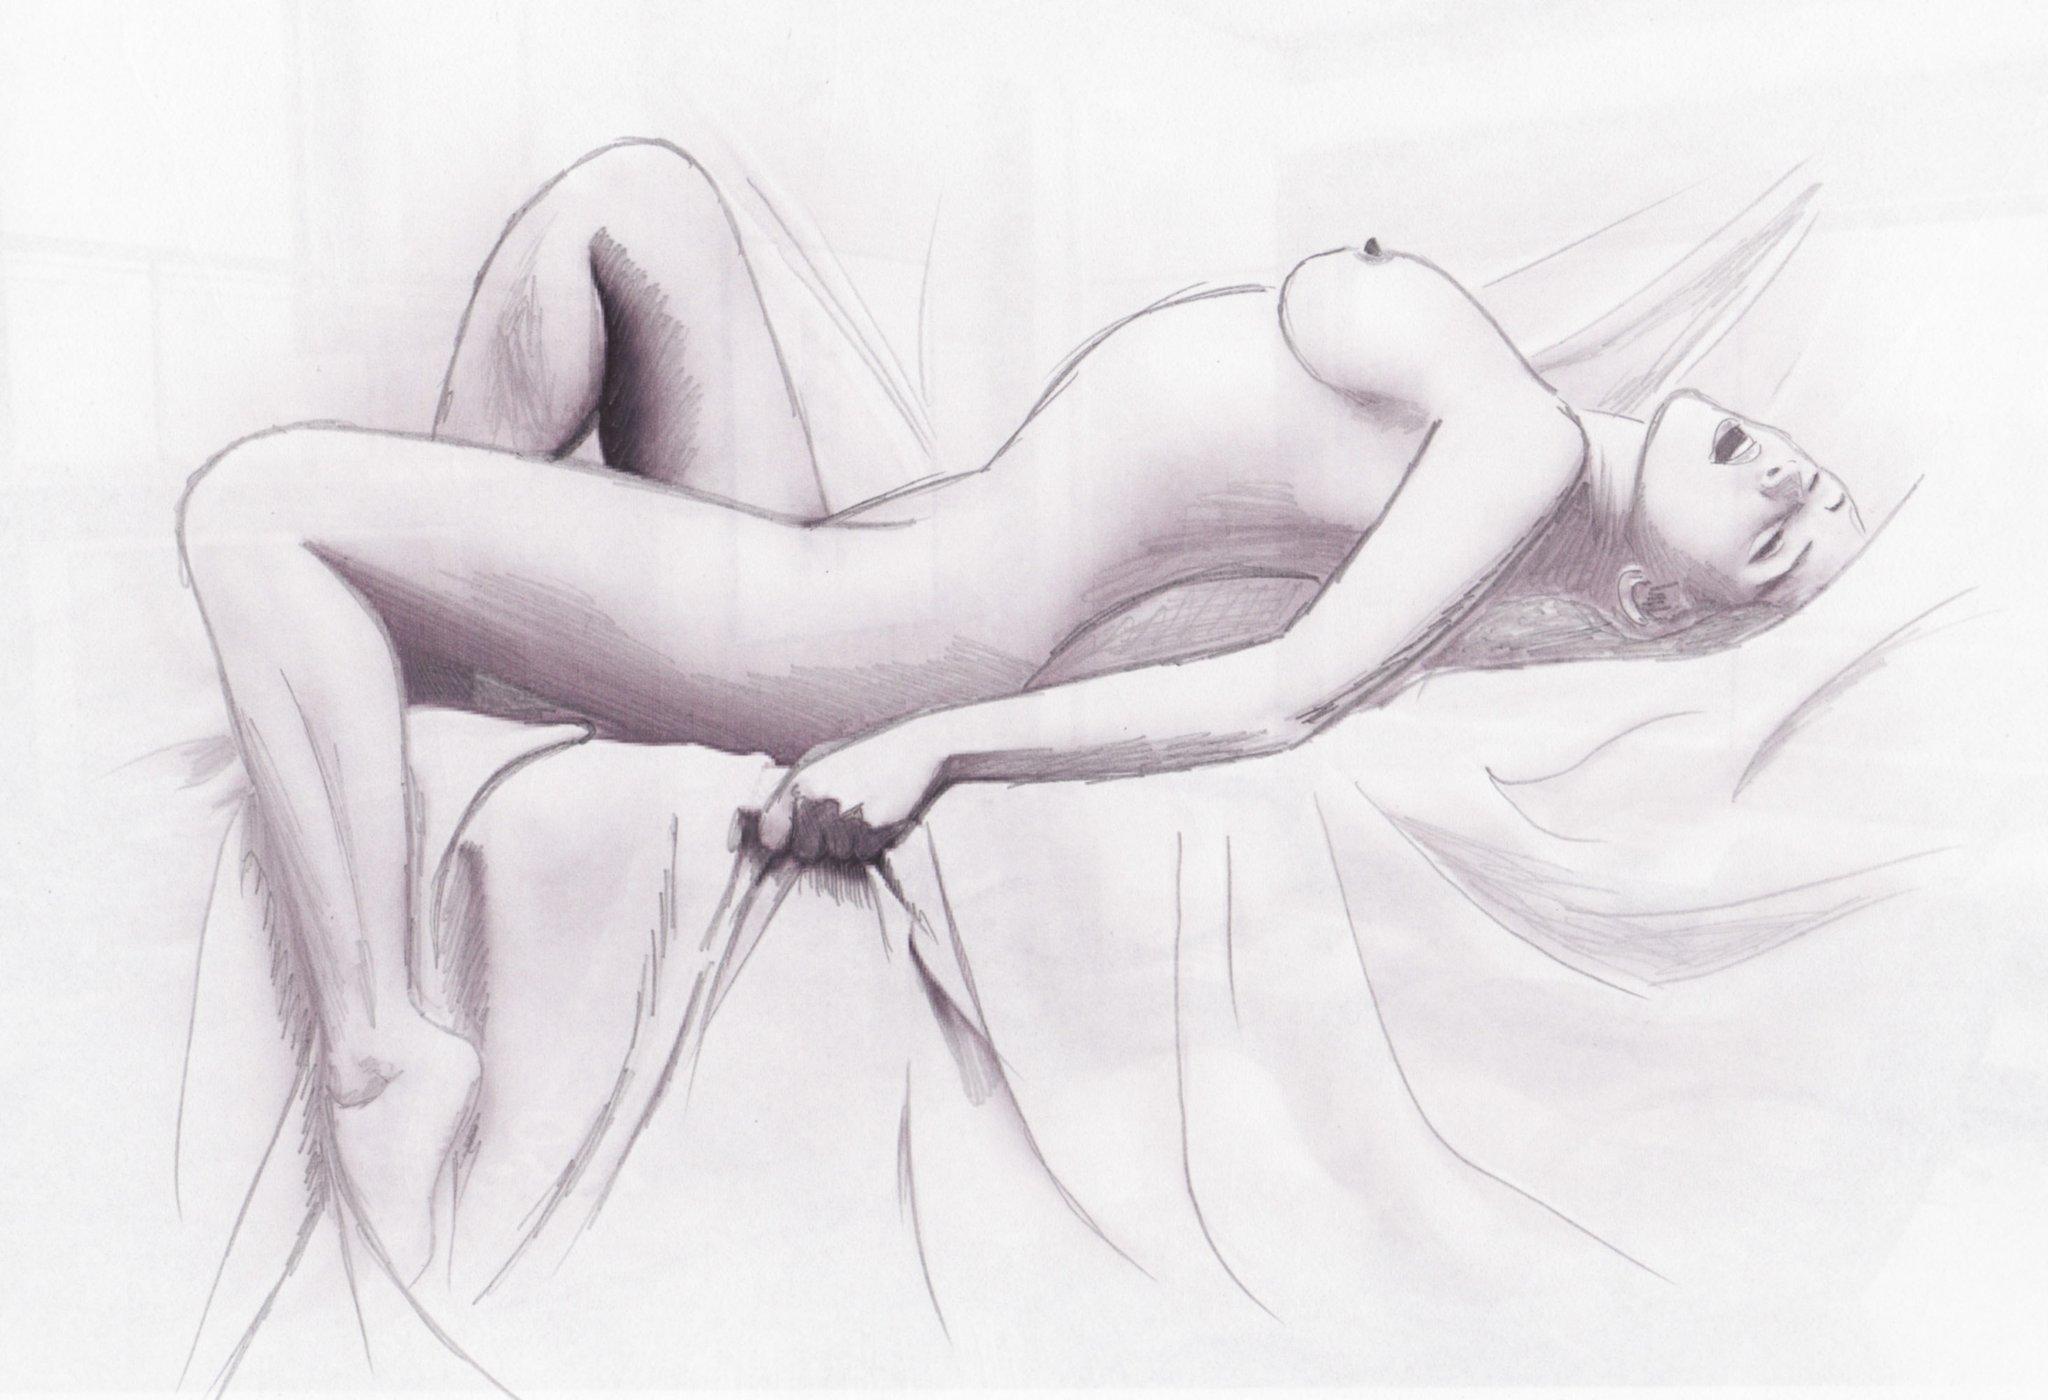 рисунки простым карандашом эротика онлайн